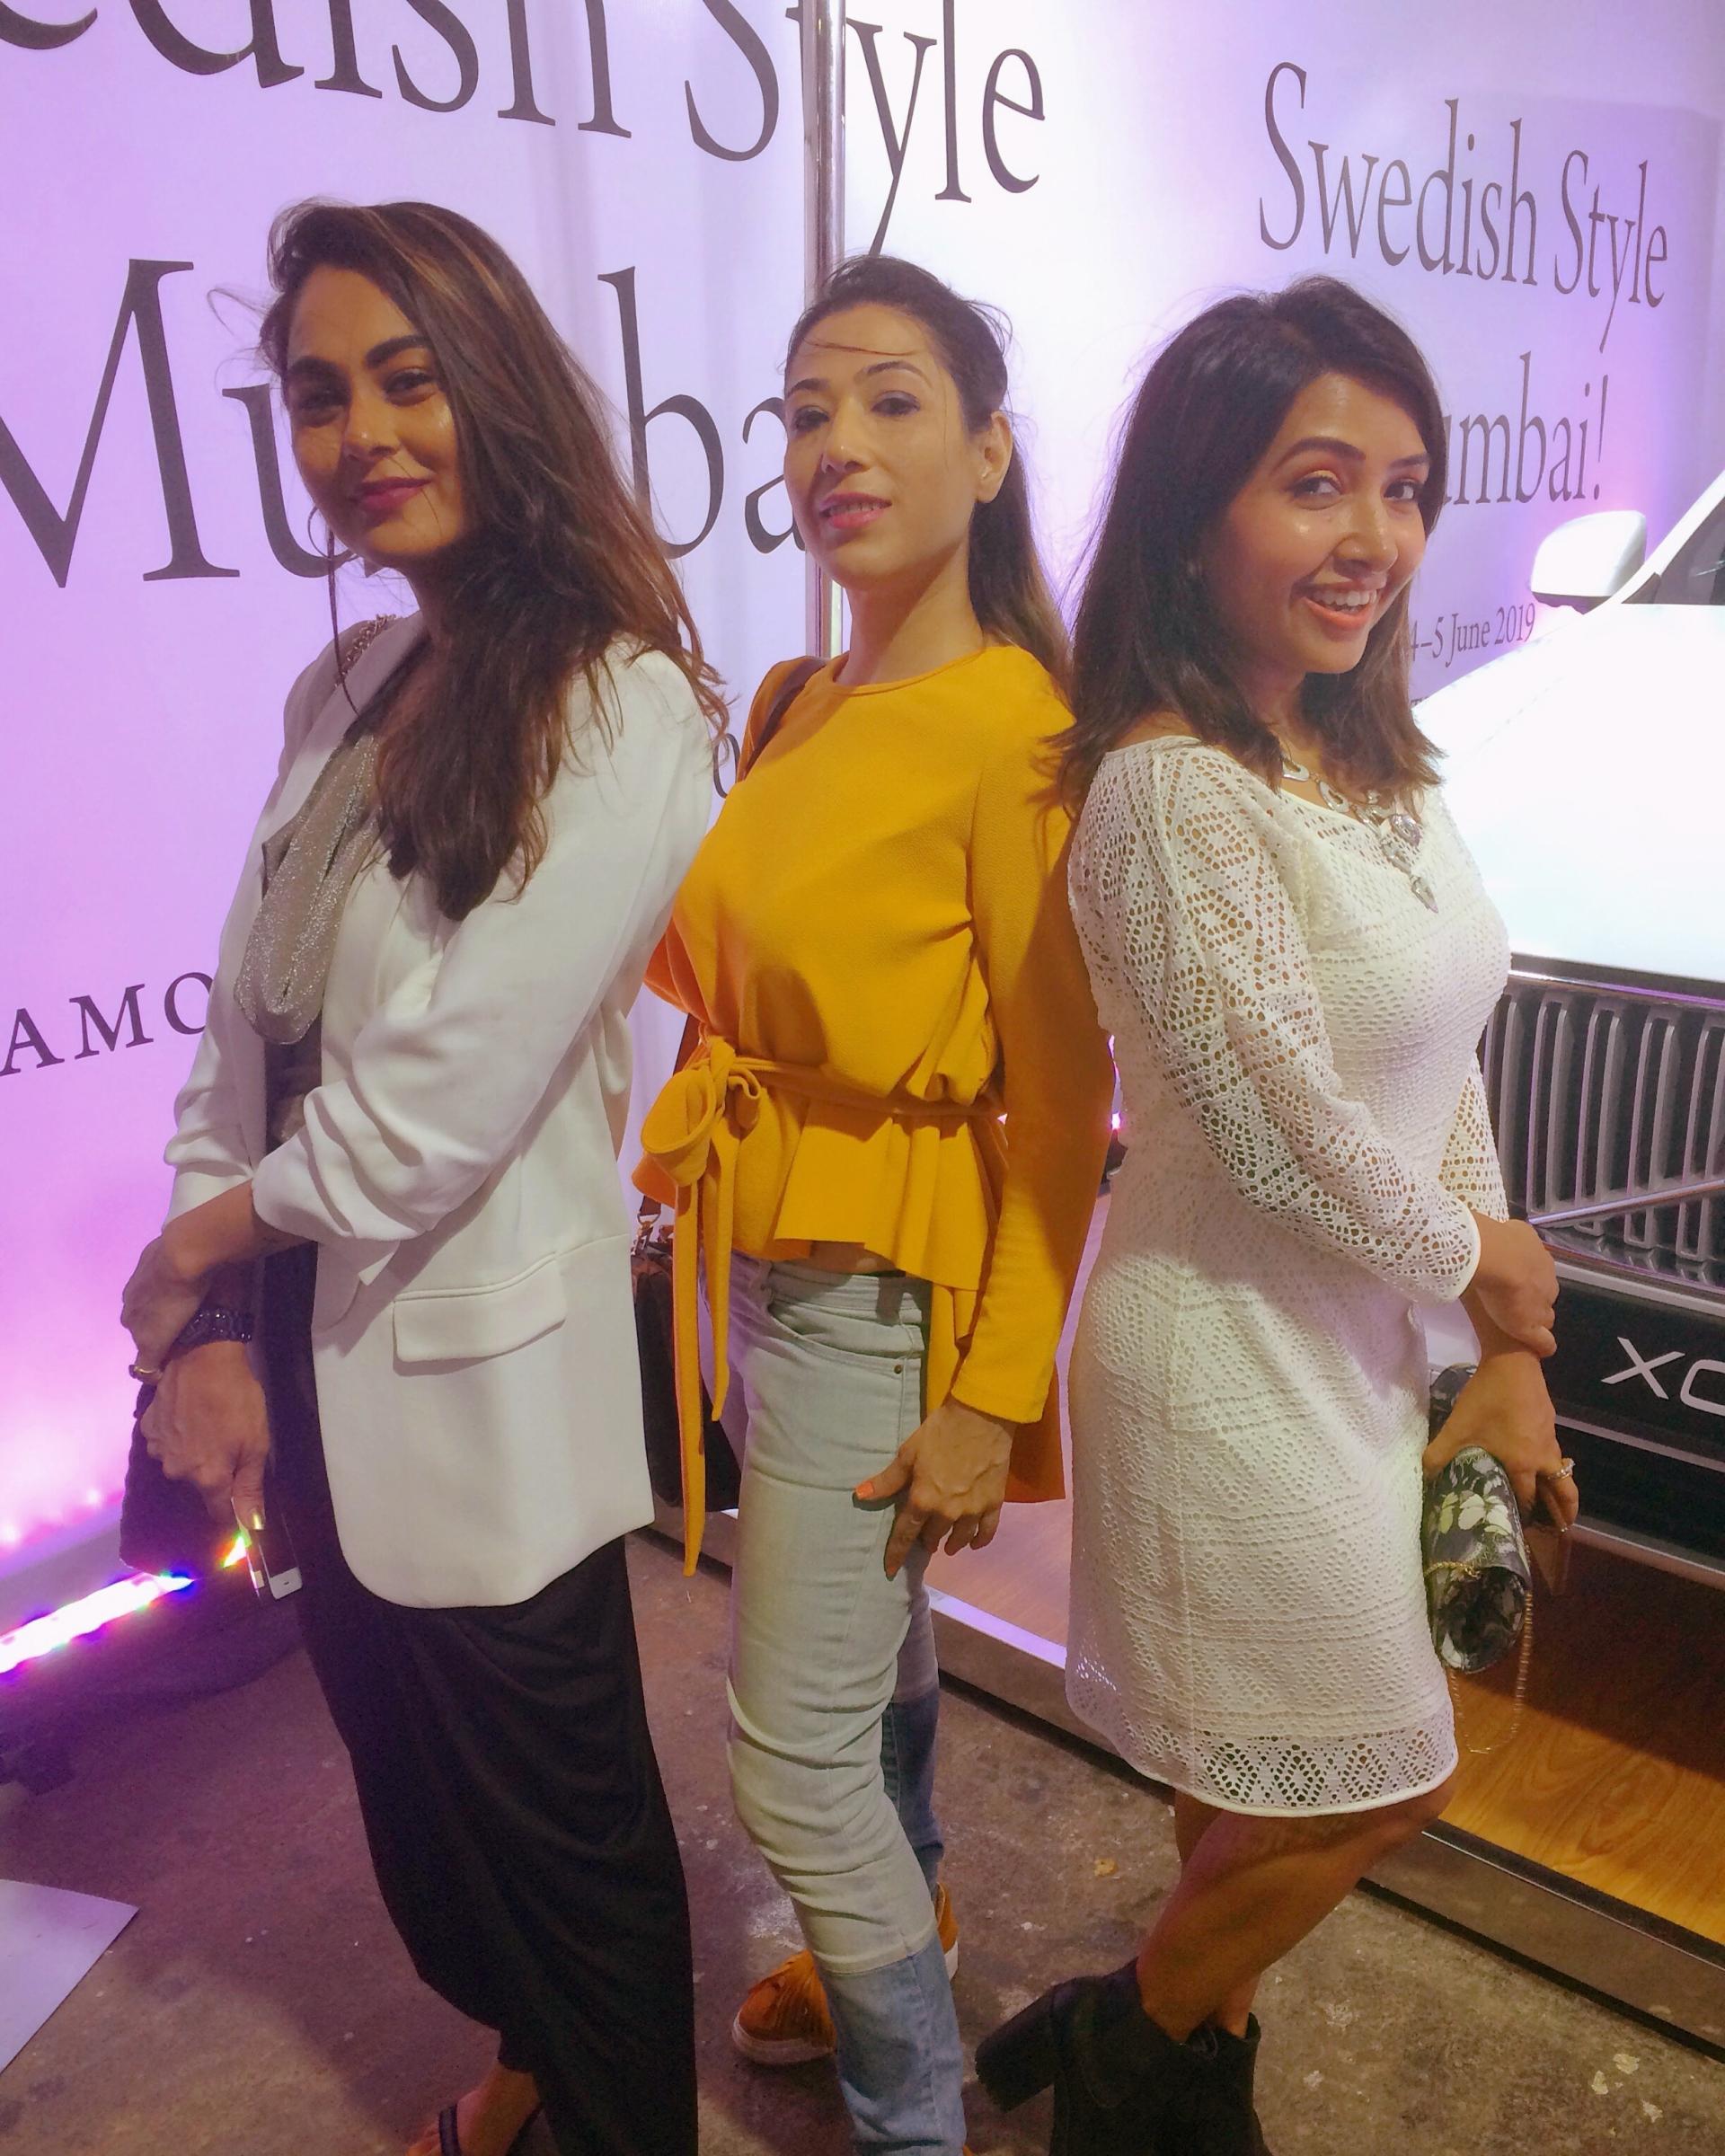 Neha Desai, Veidehi Gite and Sayanti Banerjee Swedish Style Mumbai